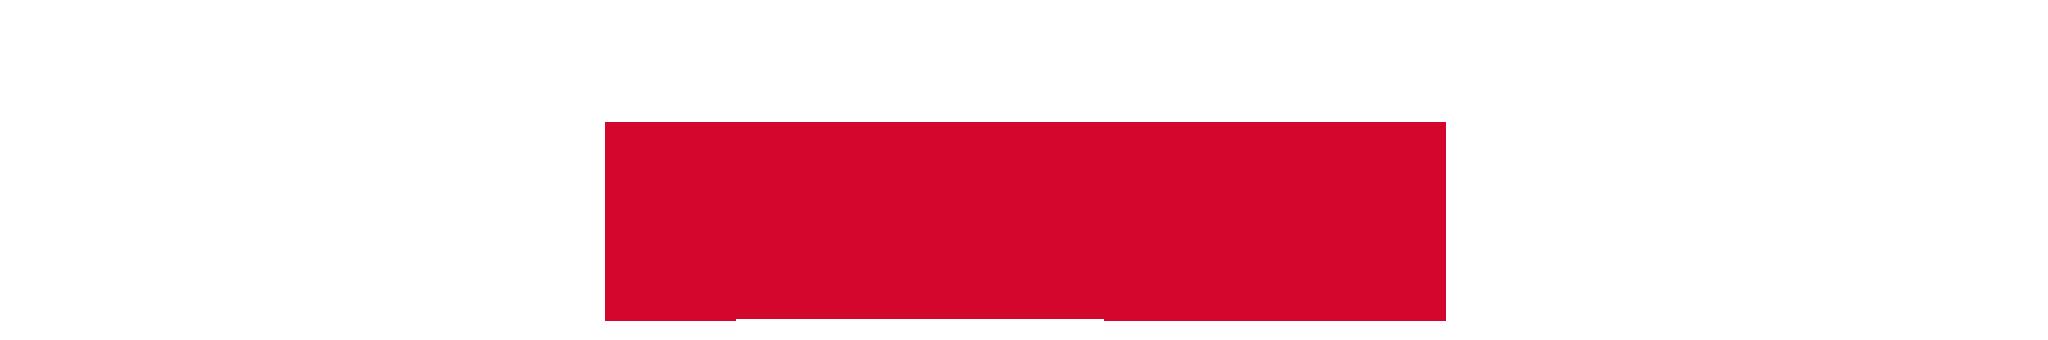 2048-340-tab-sp